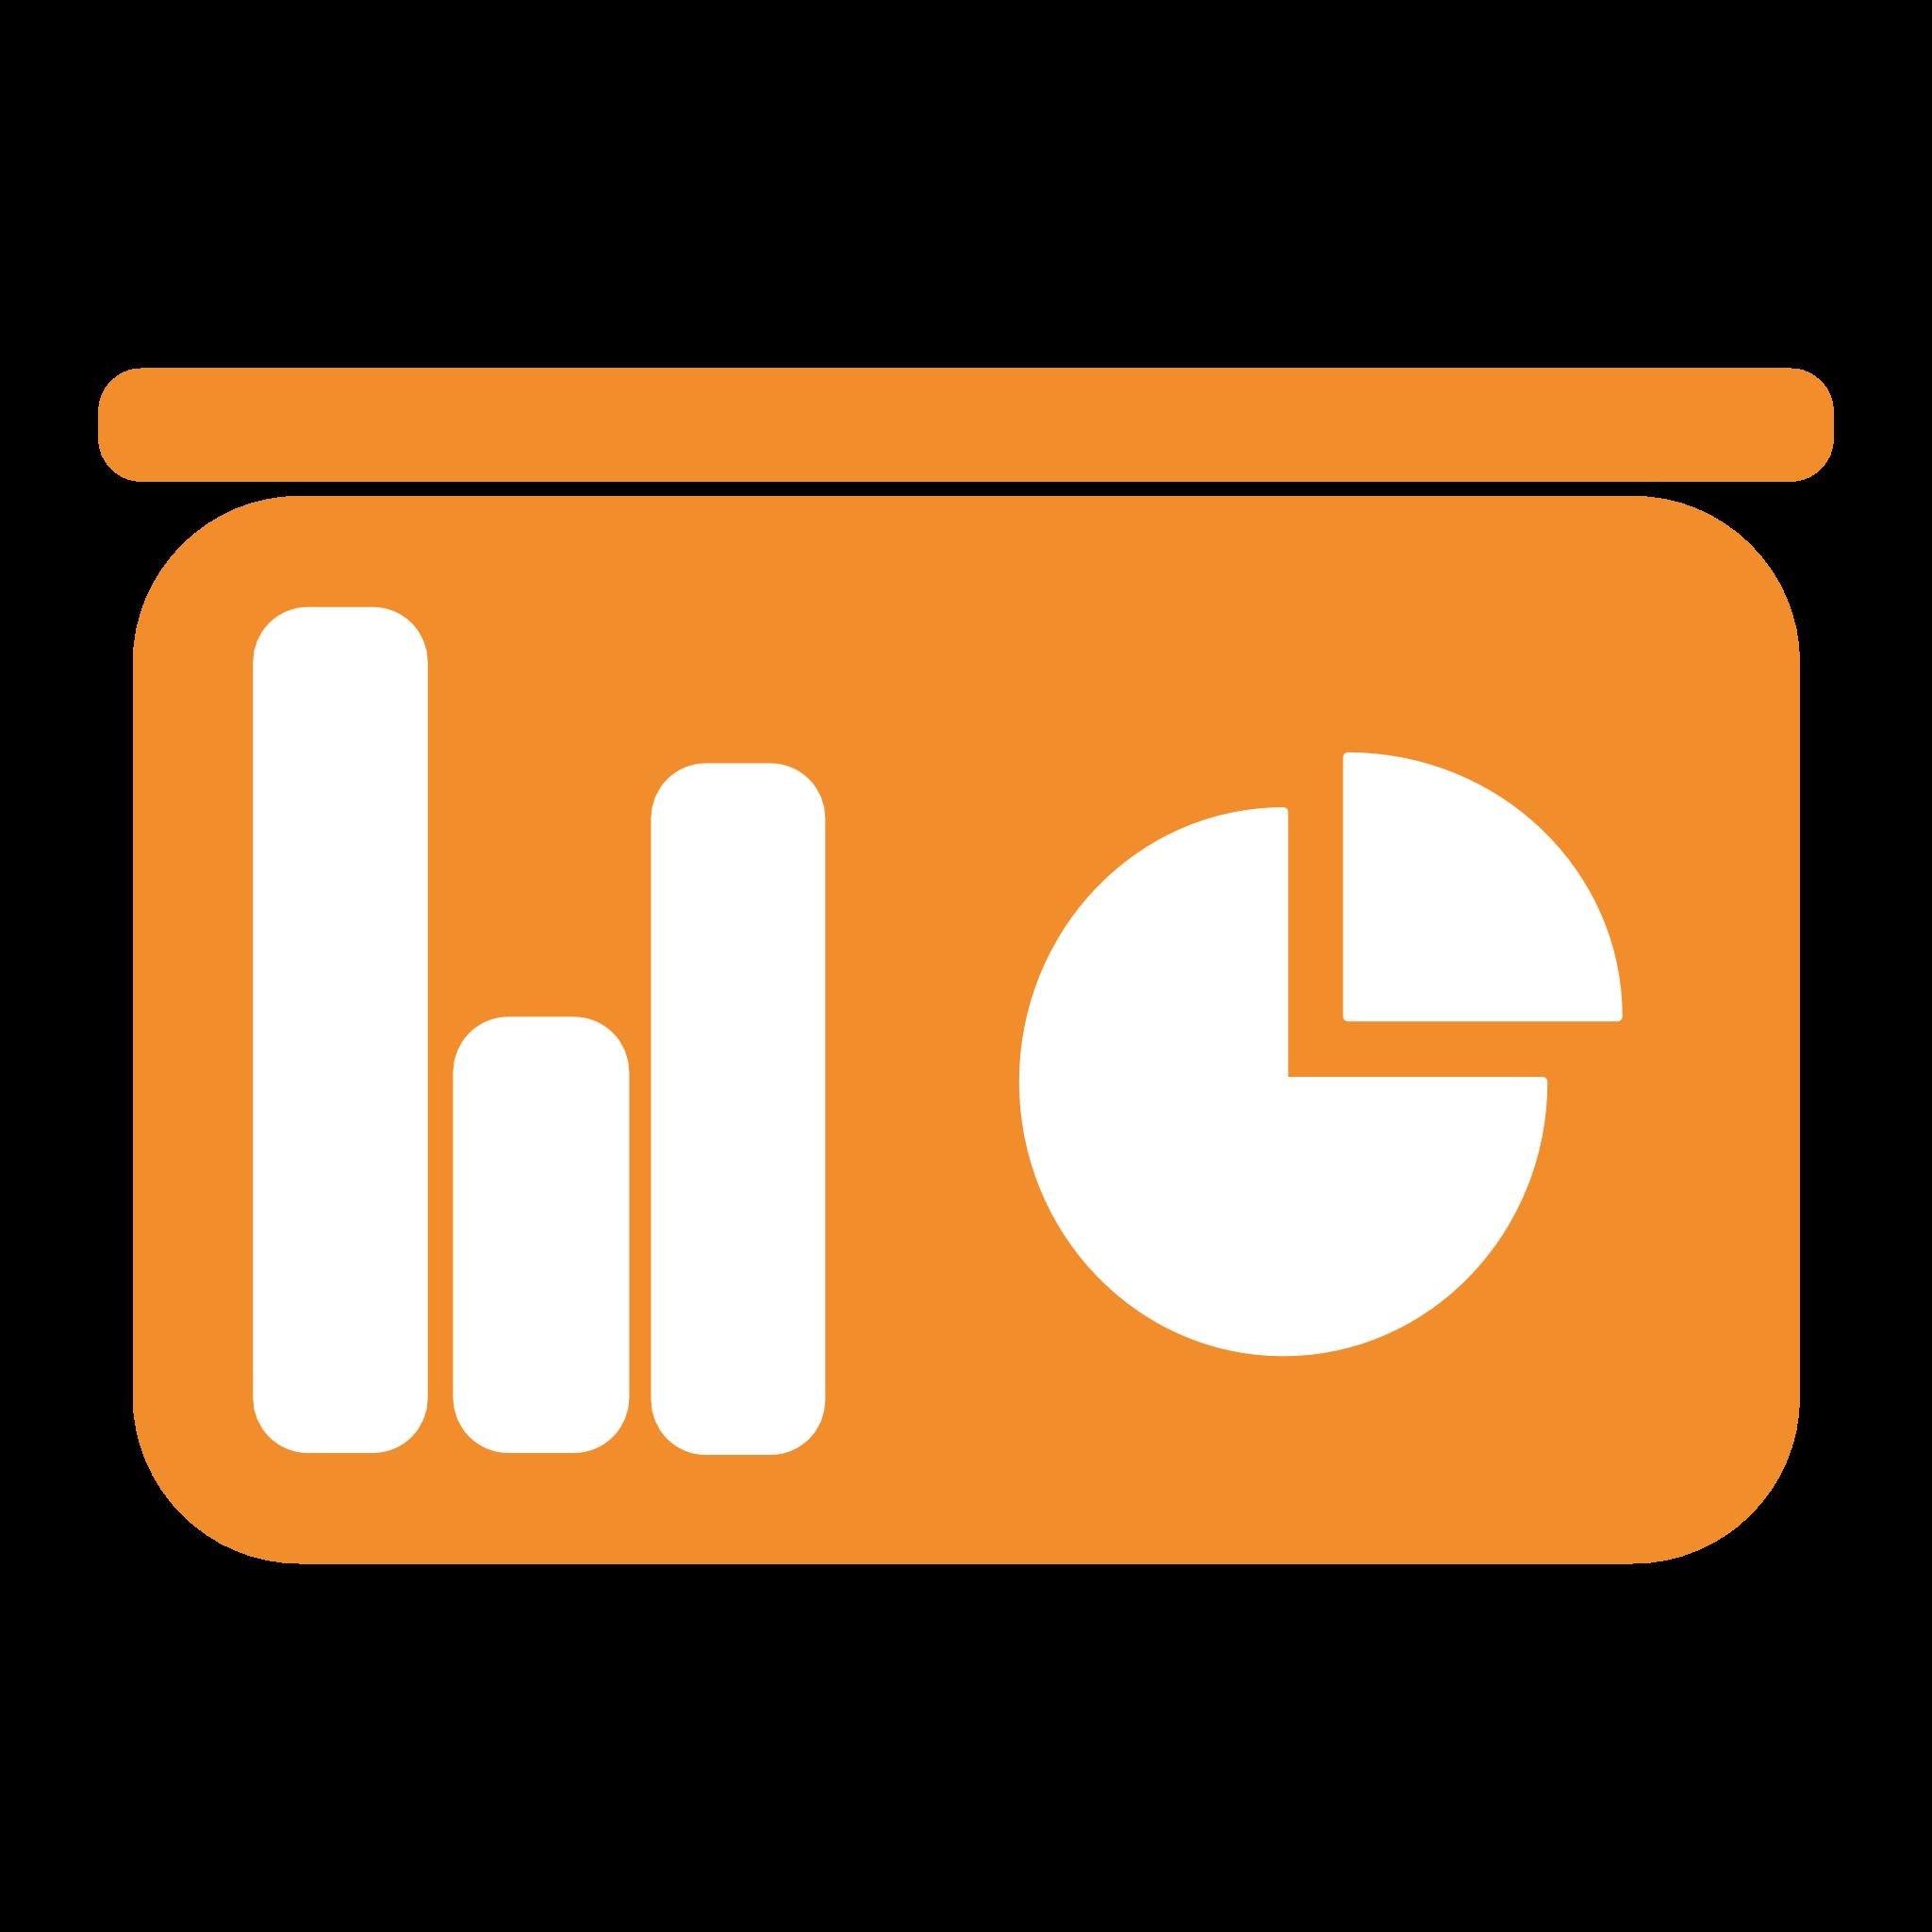 orange diagram icon